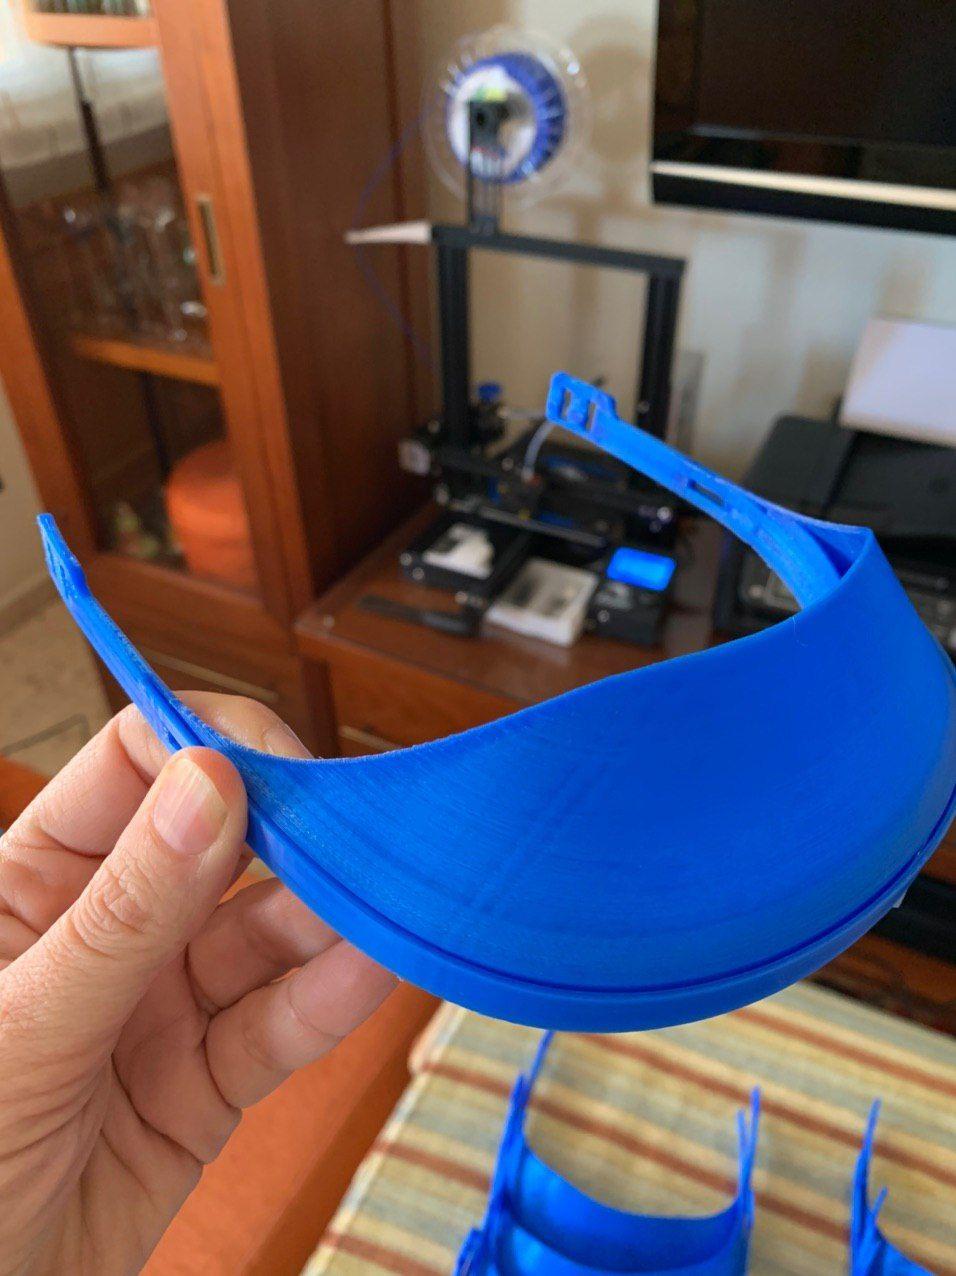 3D printed medical masks - HomeExchange coronavirus crisis response